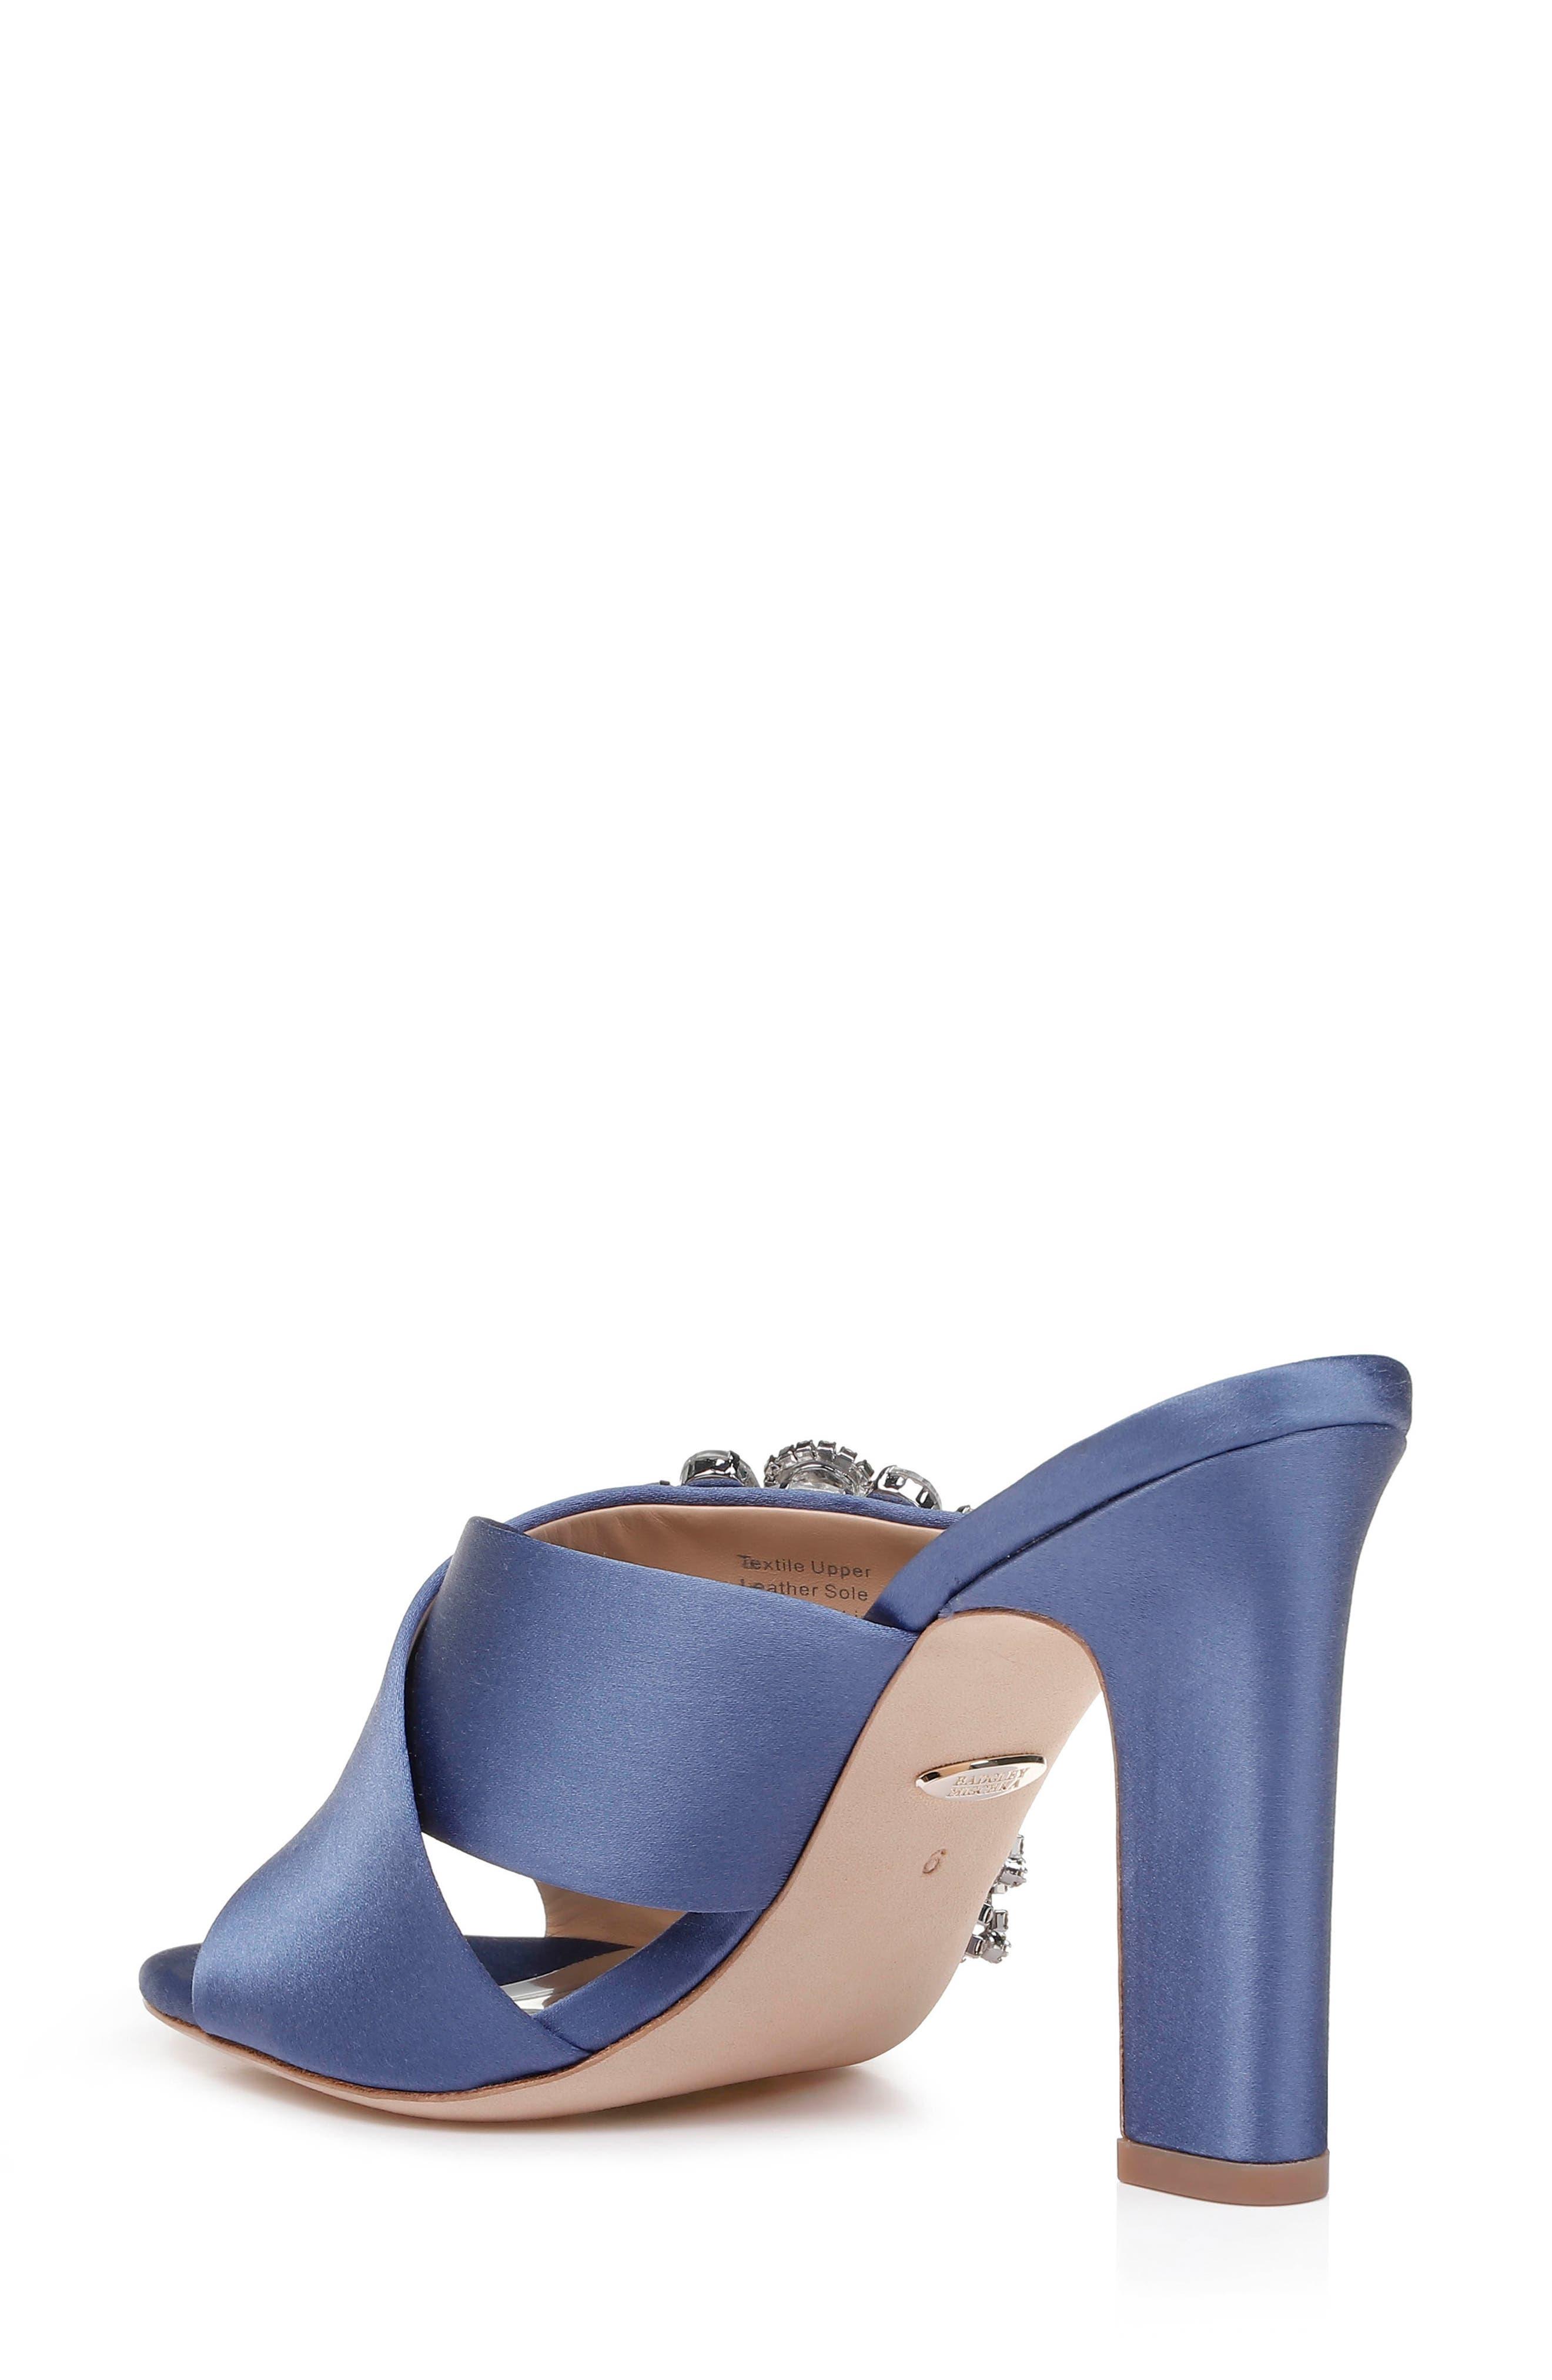 Badgley Mischka Farrah Sandal,                             Alternate thumbnail 2, color,                             ITALIAN BLUE SATIN